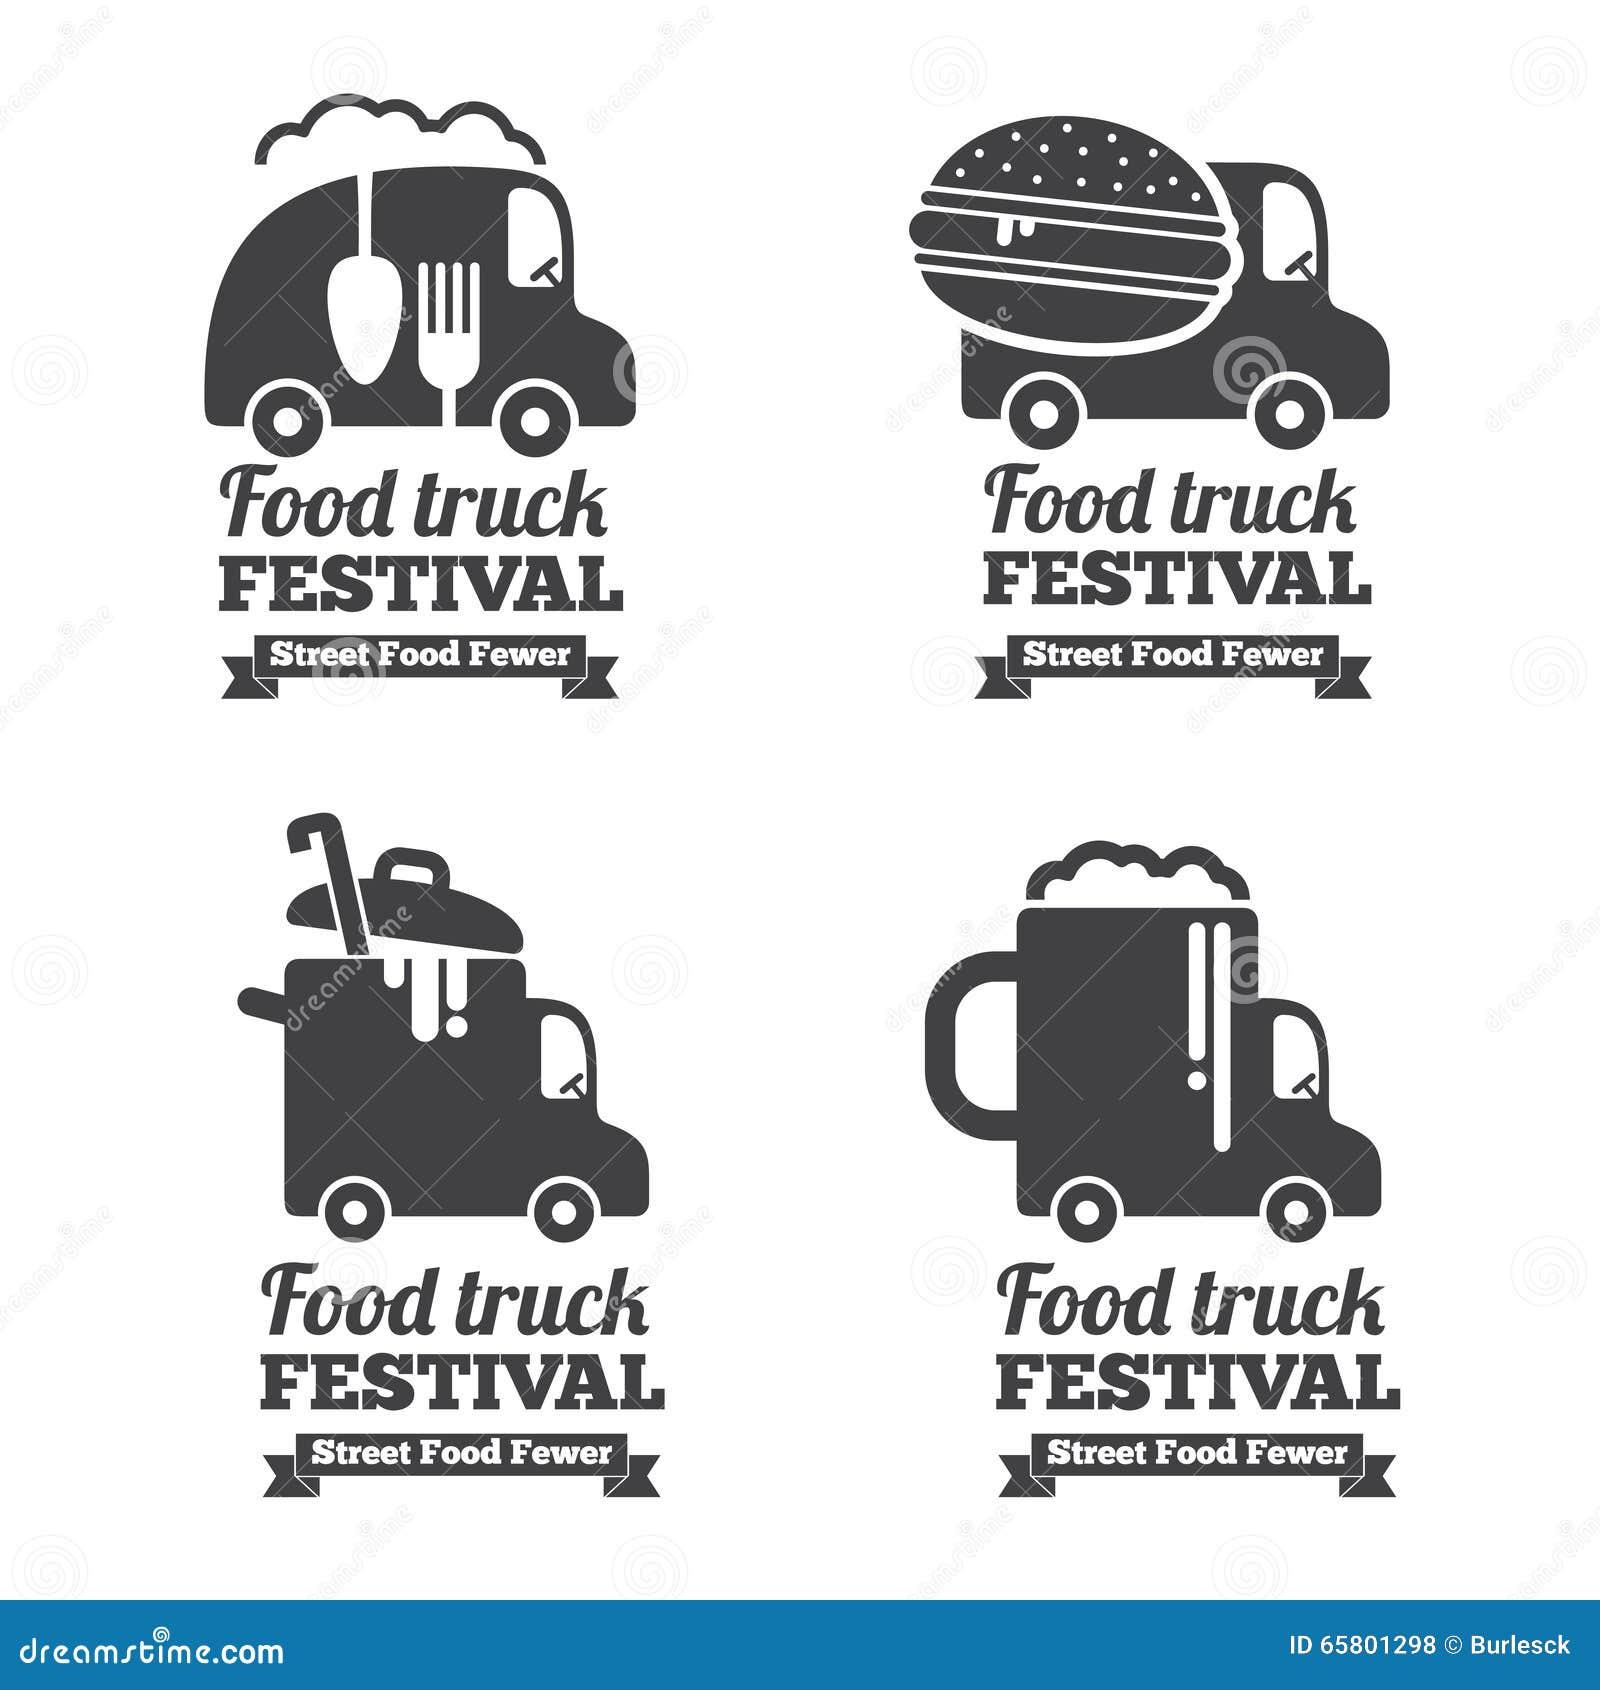 Chef Dreams Food Truck